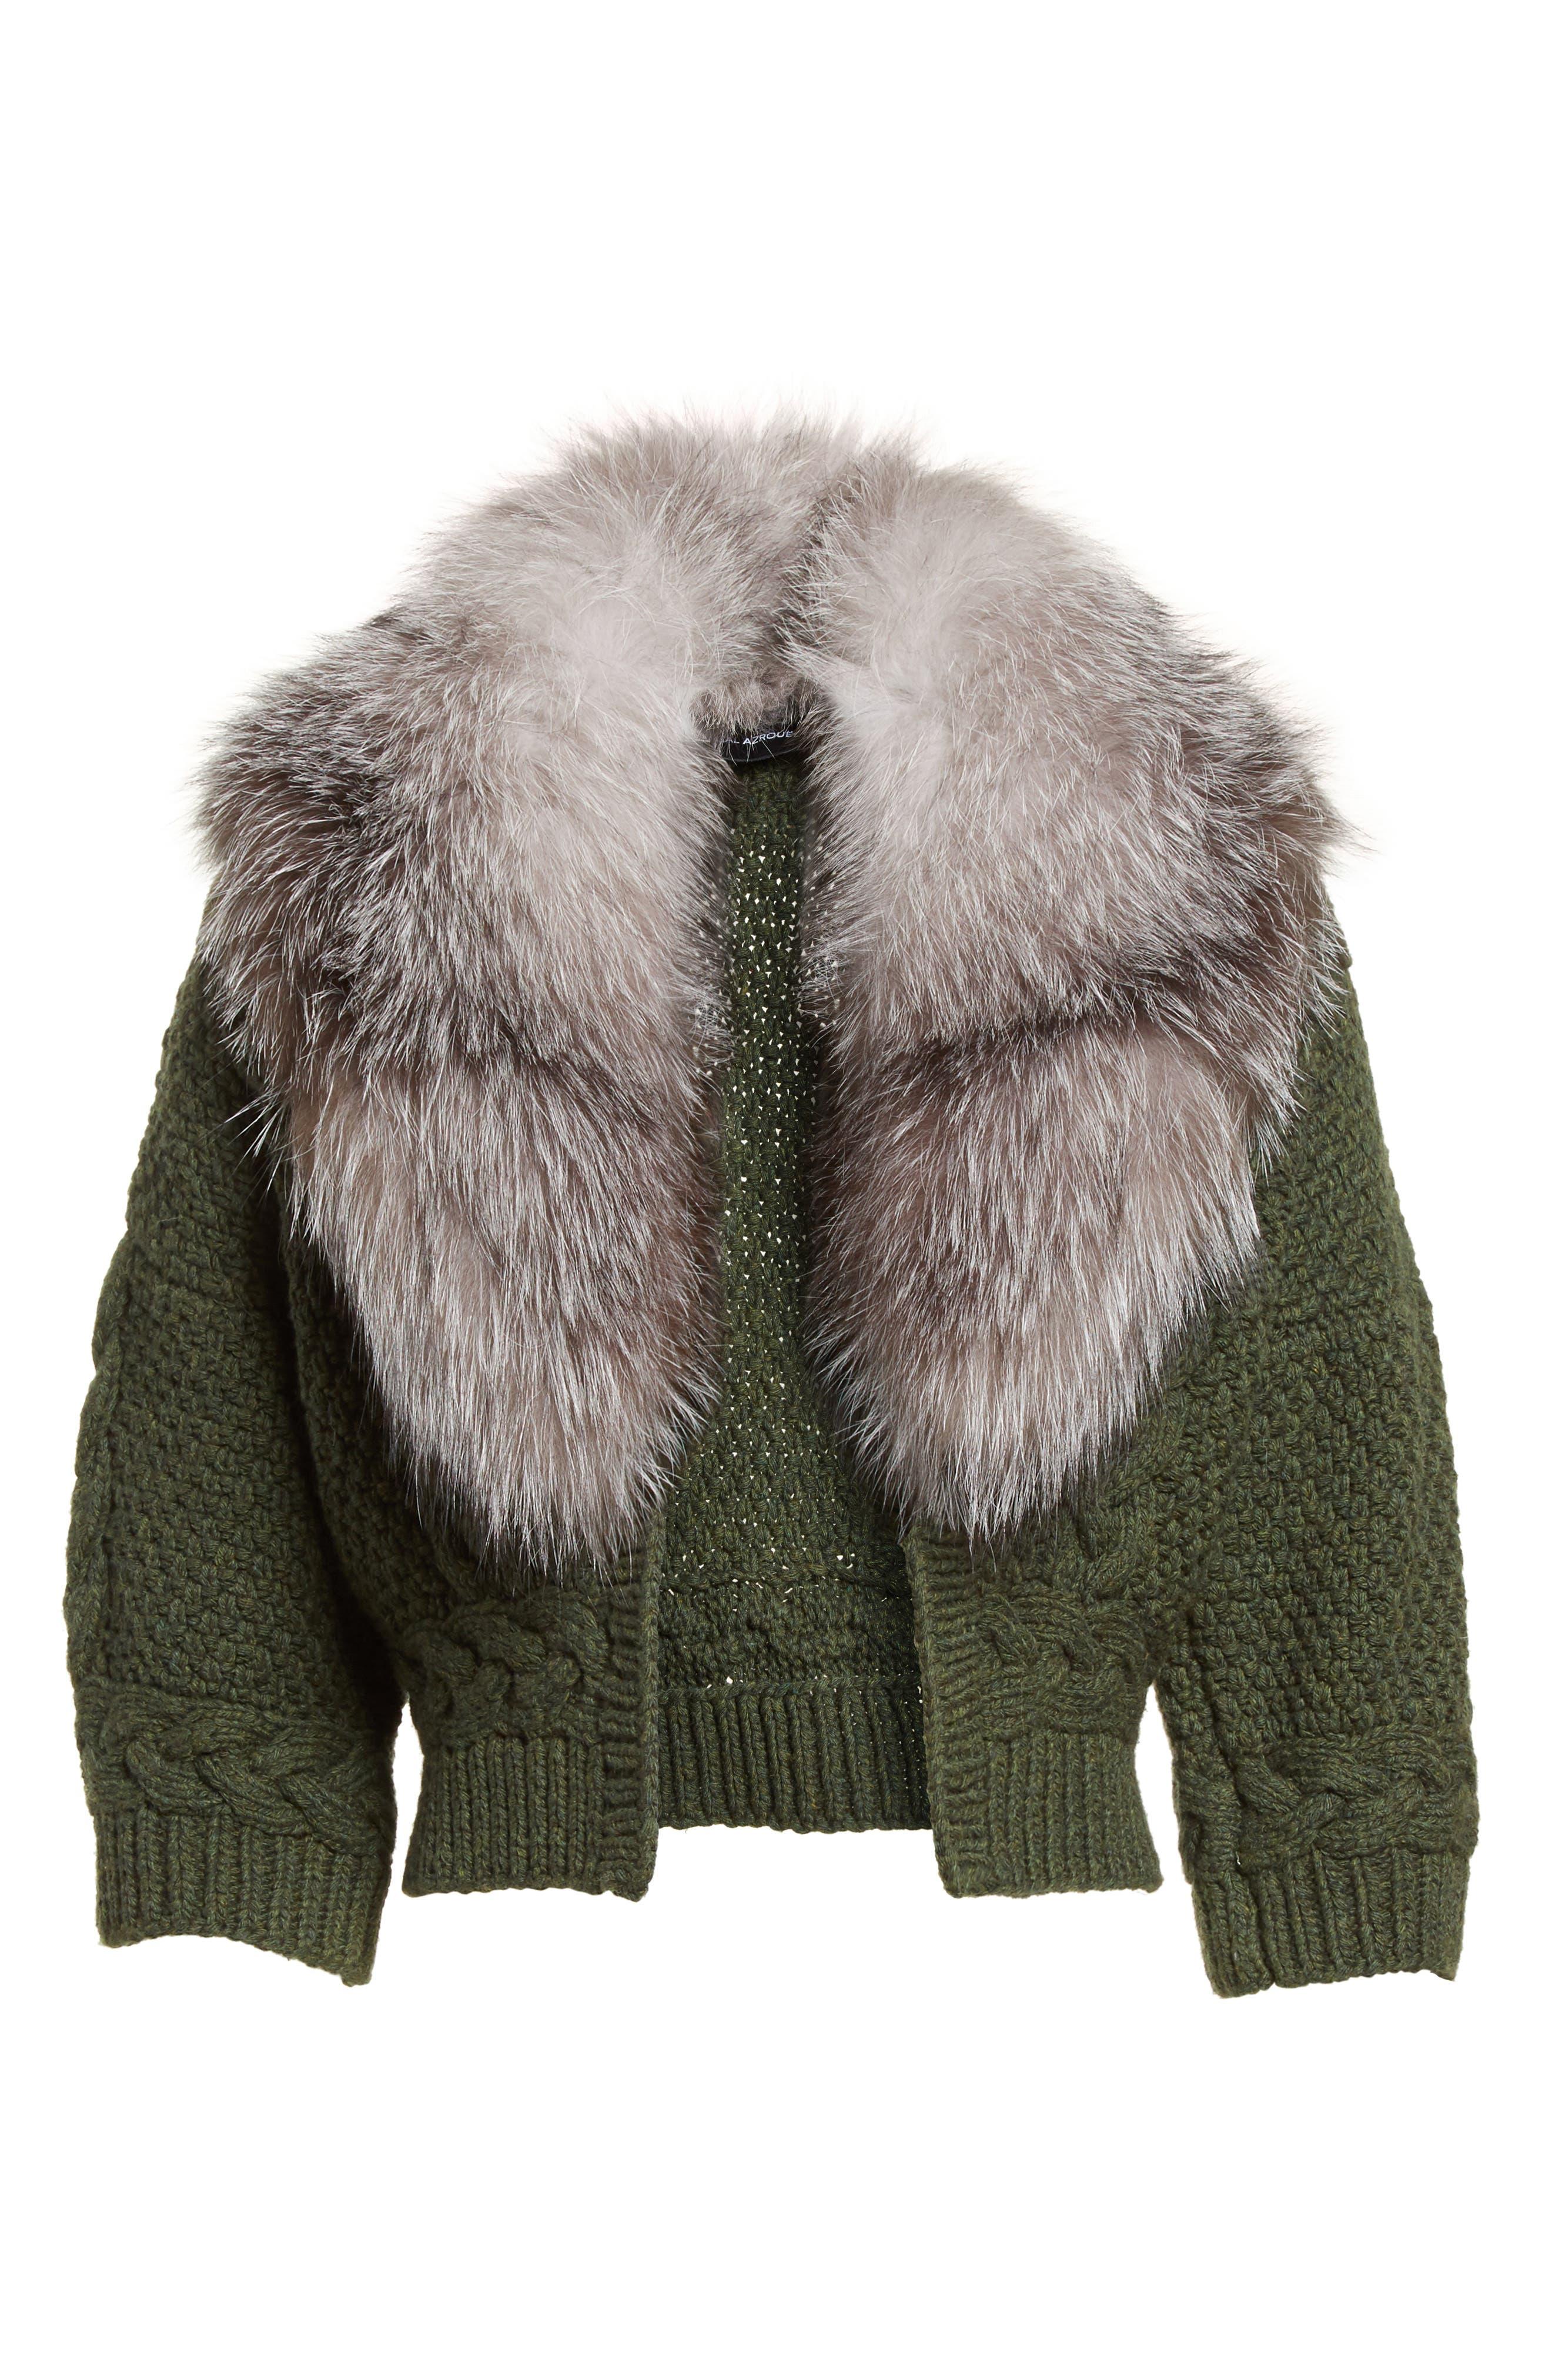 Merino Wool & Cashmere Knit Bolero with Removable Genuine Fox Fur Collar,                             Alternate thumbnail 6, color,                             087